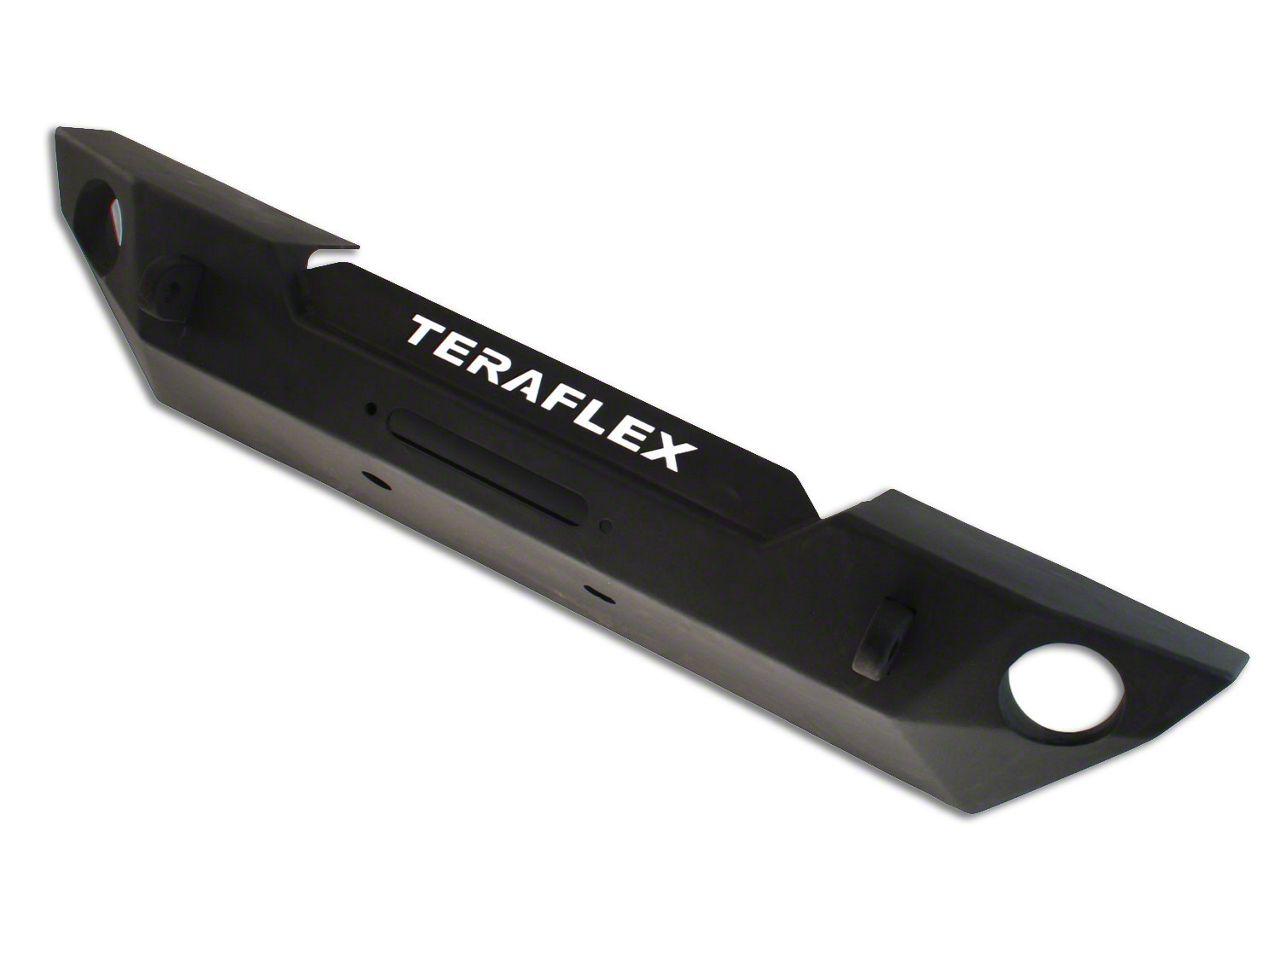 Teraflex Front Epic Bumper for Center Drum Winch (07-18 Jeep Wrangler JK)